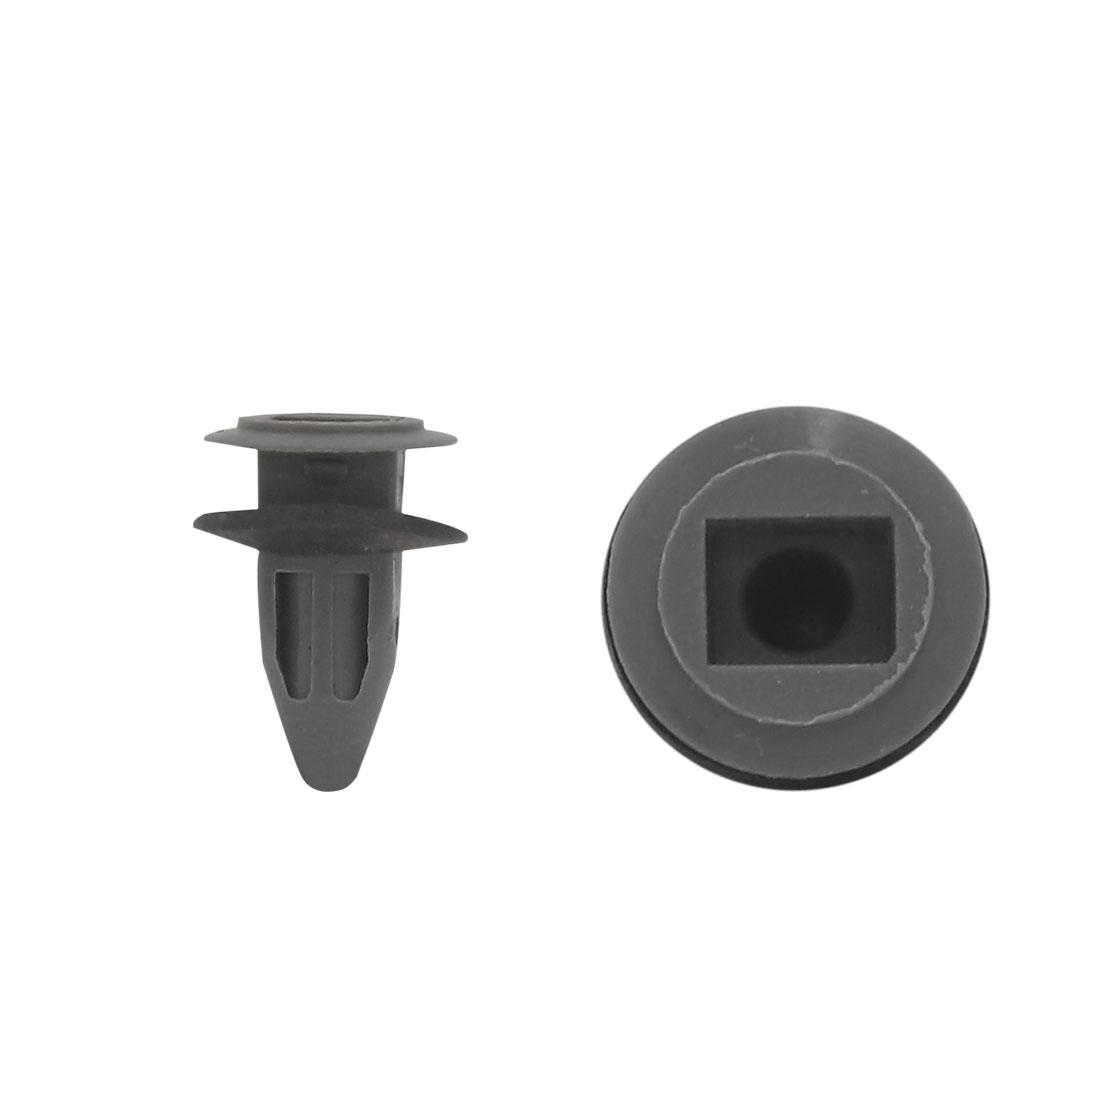 50Pcs 10mm x 8mm Hole Bumper Hood Fender Splash Guard Retainer Clips Fasteners